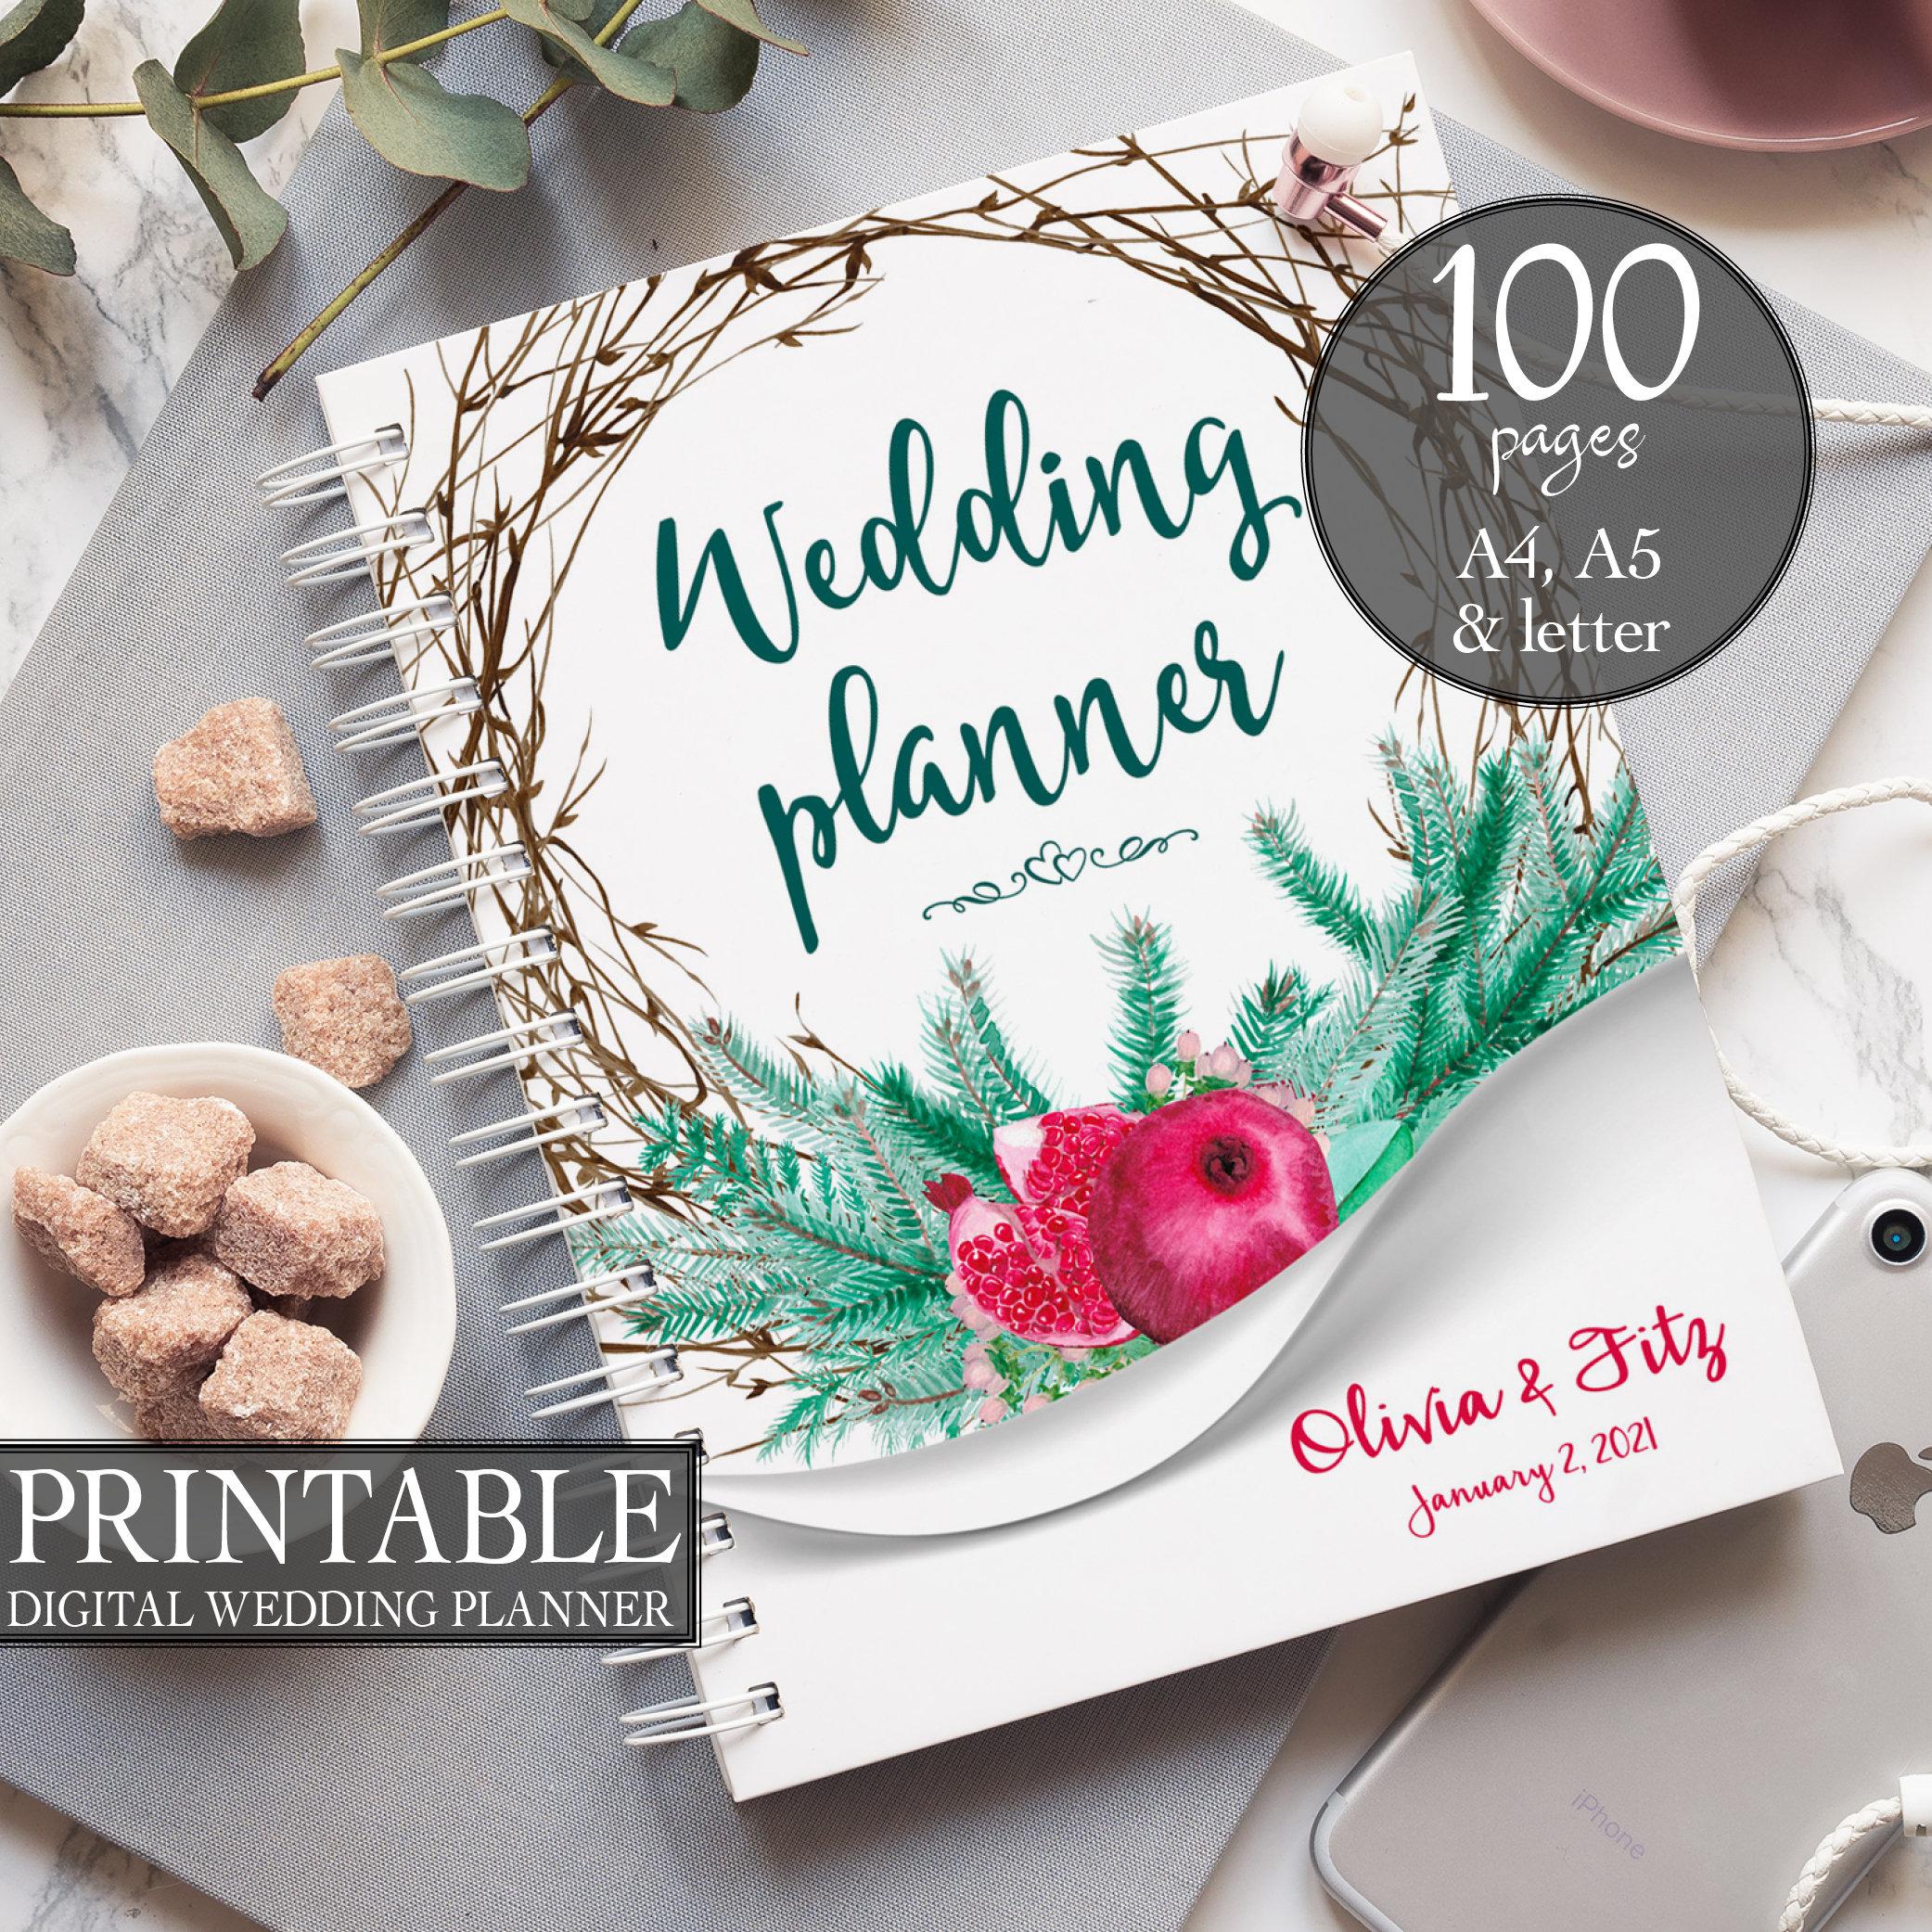 Winter wedding planner, DIY wedding binder, Pine wedding